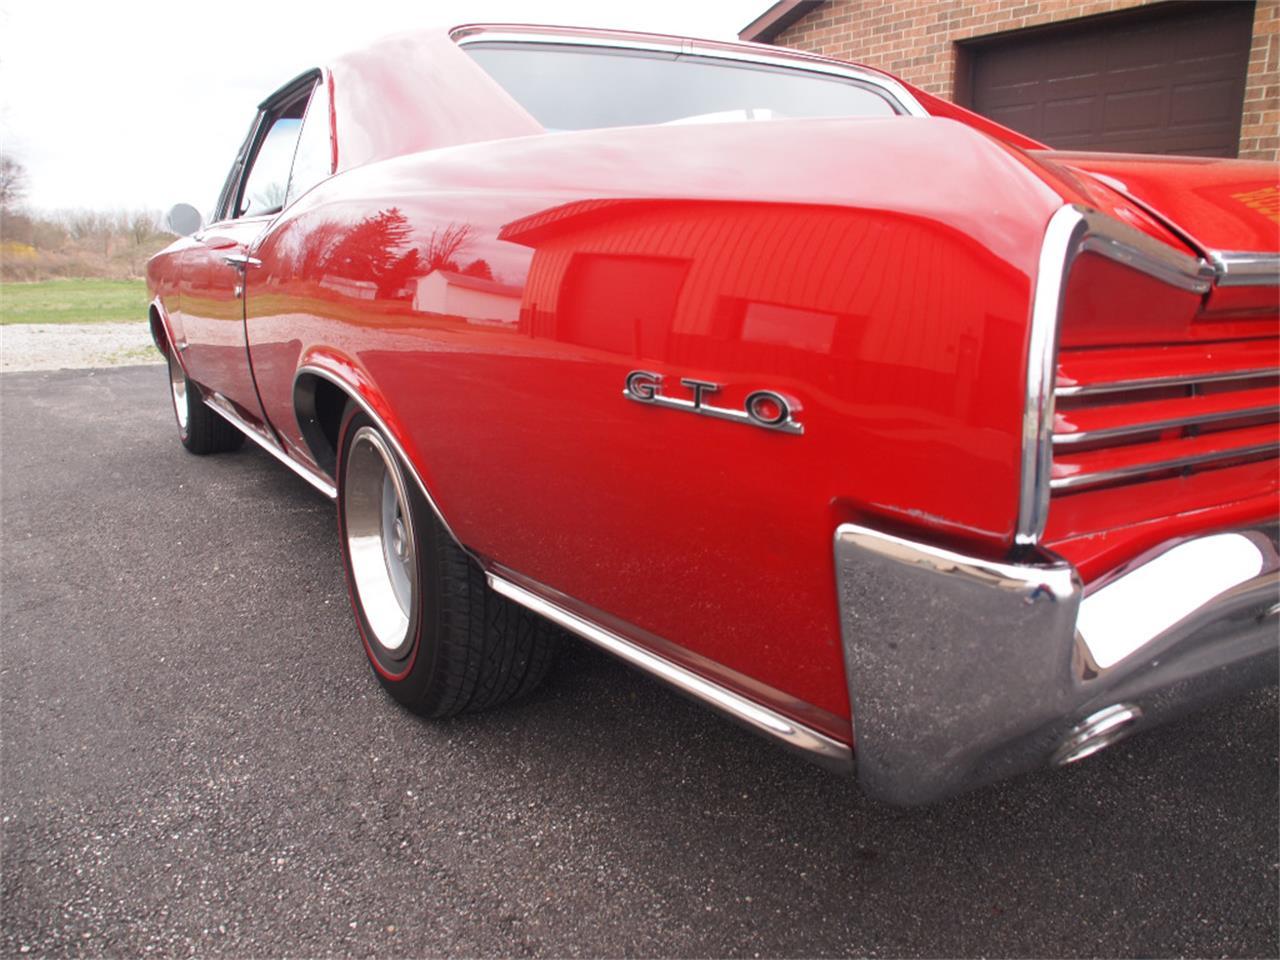 Large Picture of '66 Pontiac GTO - $59,500.00 - KYVG